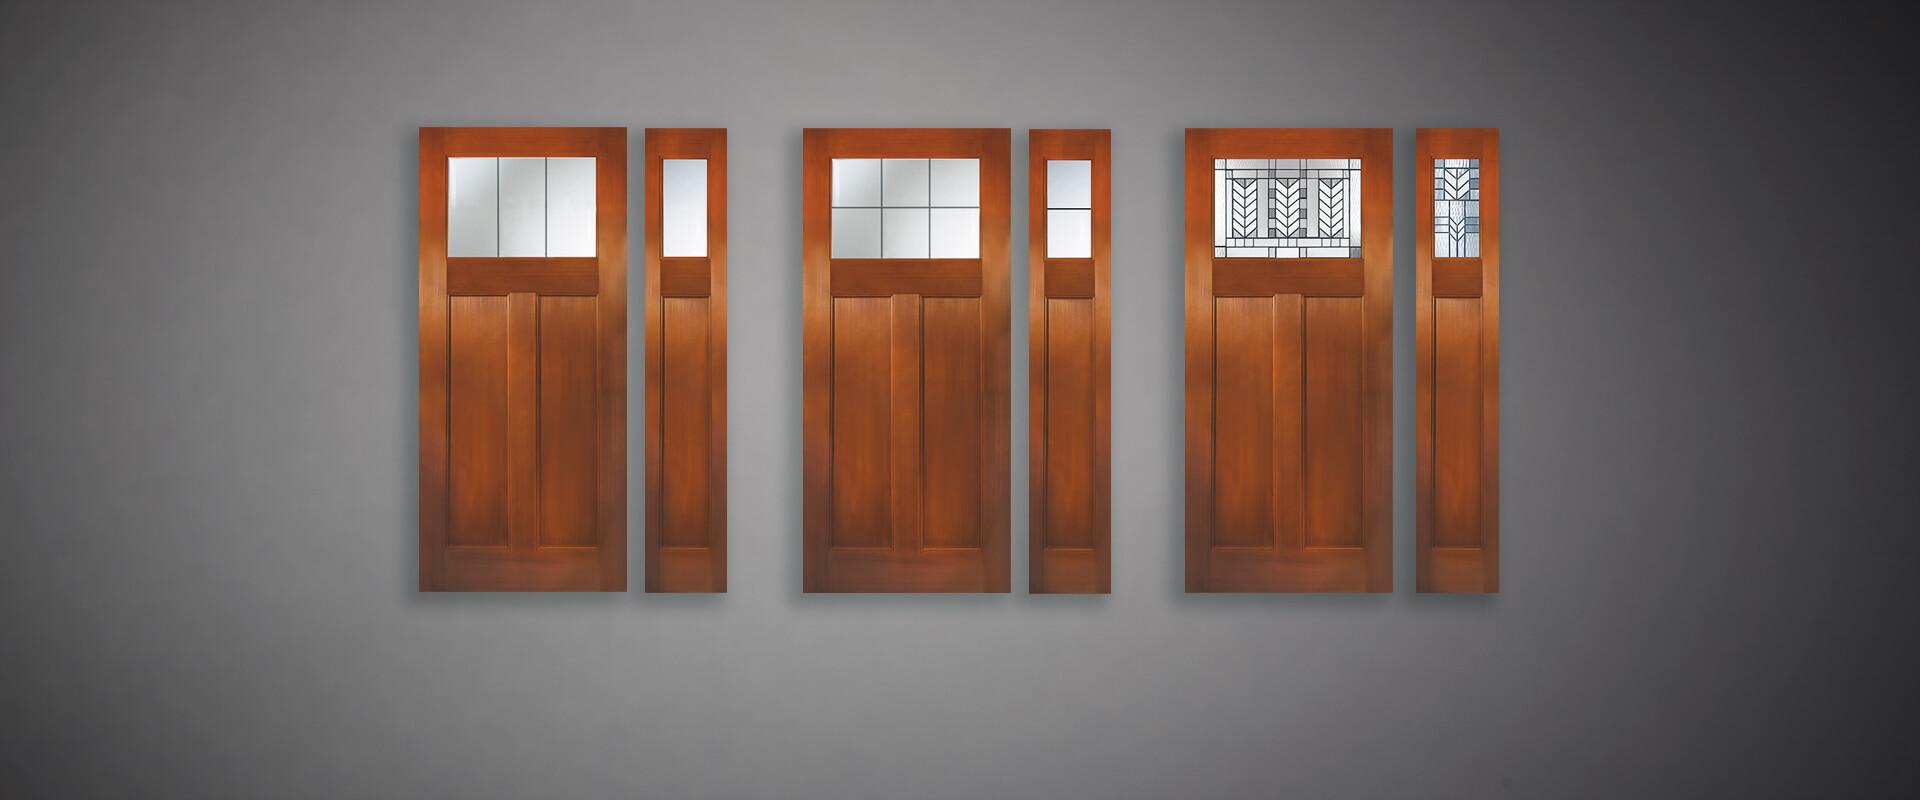 Craftsman Fir Fiberglass Doors Kolbe Windows Amp Doors